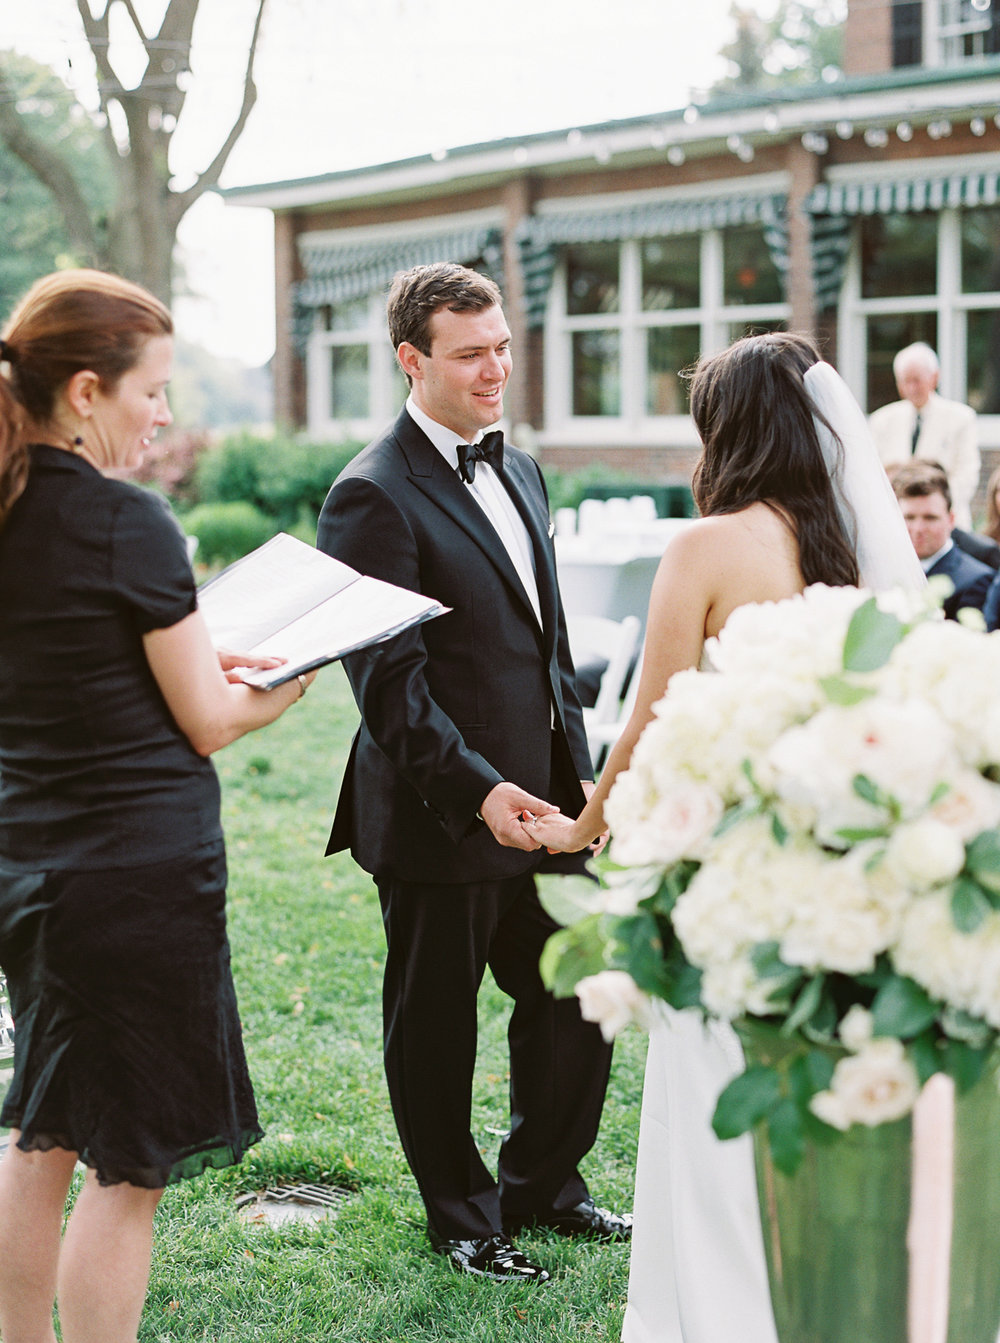 0416-Nadia-Chris-Married-When He Founf Her-Toronto Golf Club.jpg